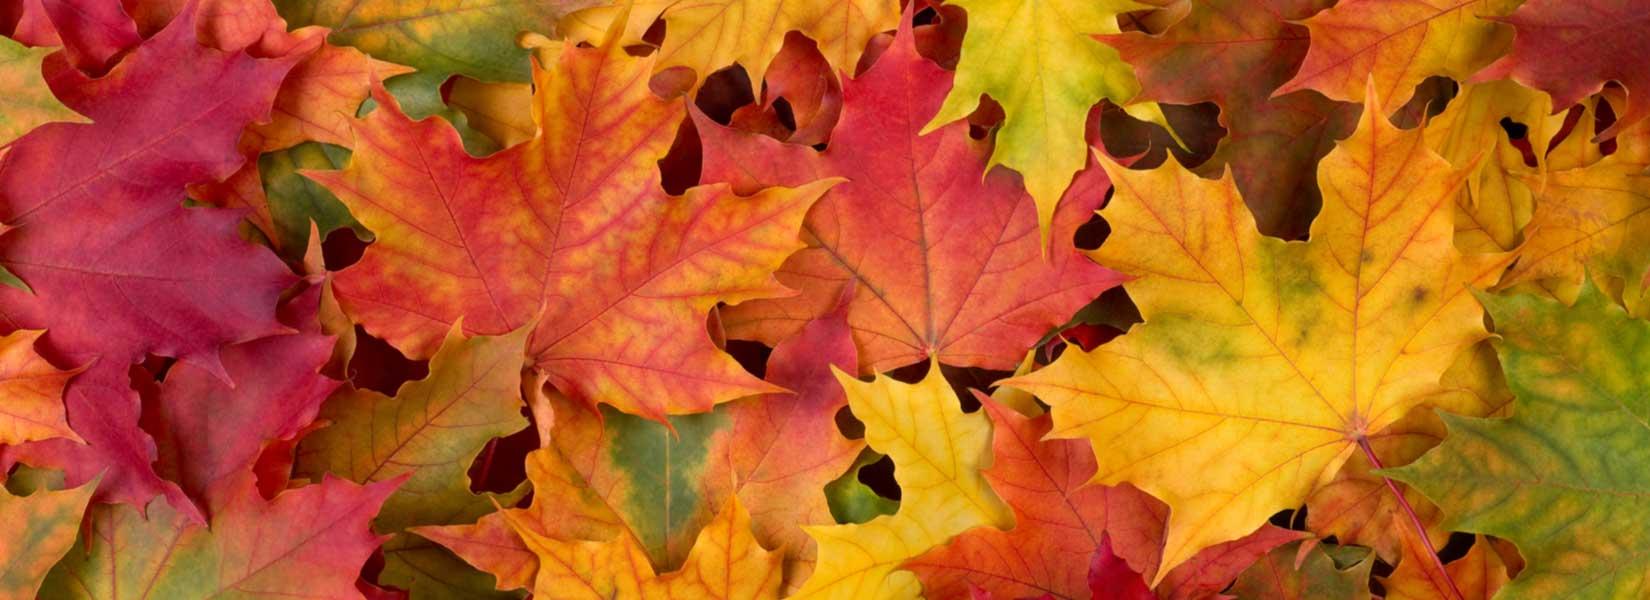 HVAC Maintenance Tips For The Fall Season